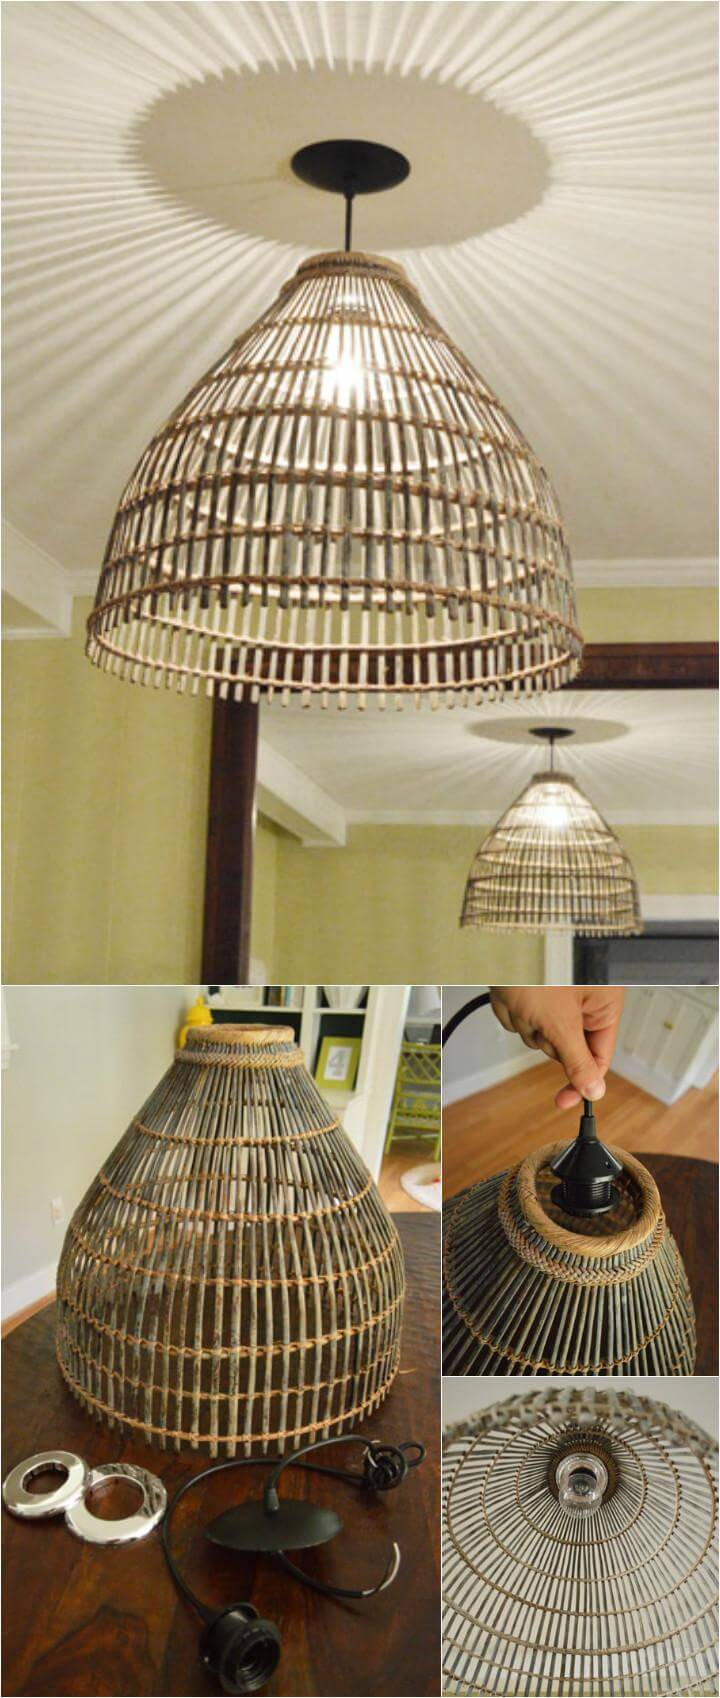 reclaimed basket into beautiful pendant light